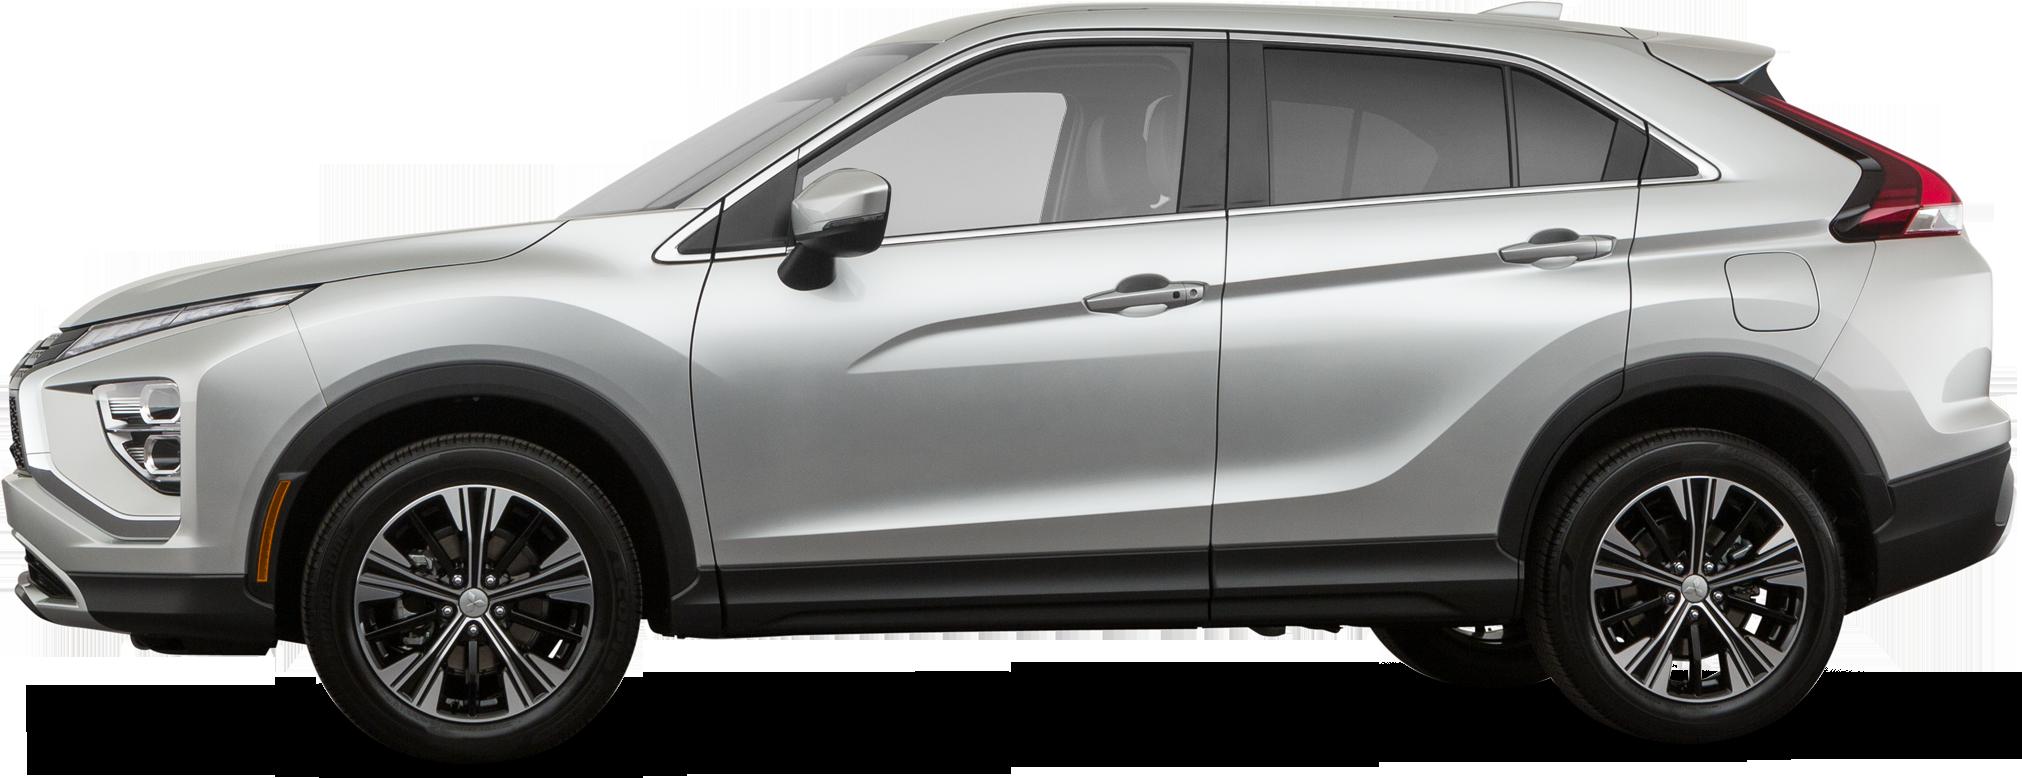 2022 Mitsubishi Eclipse Cross SUV SE